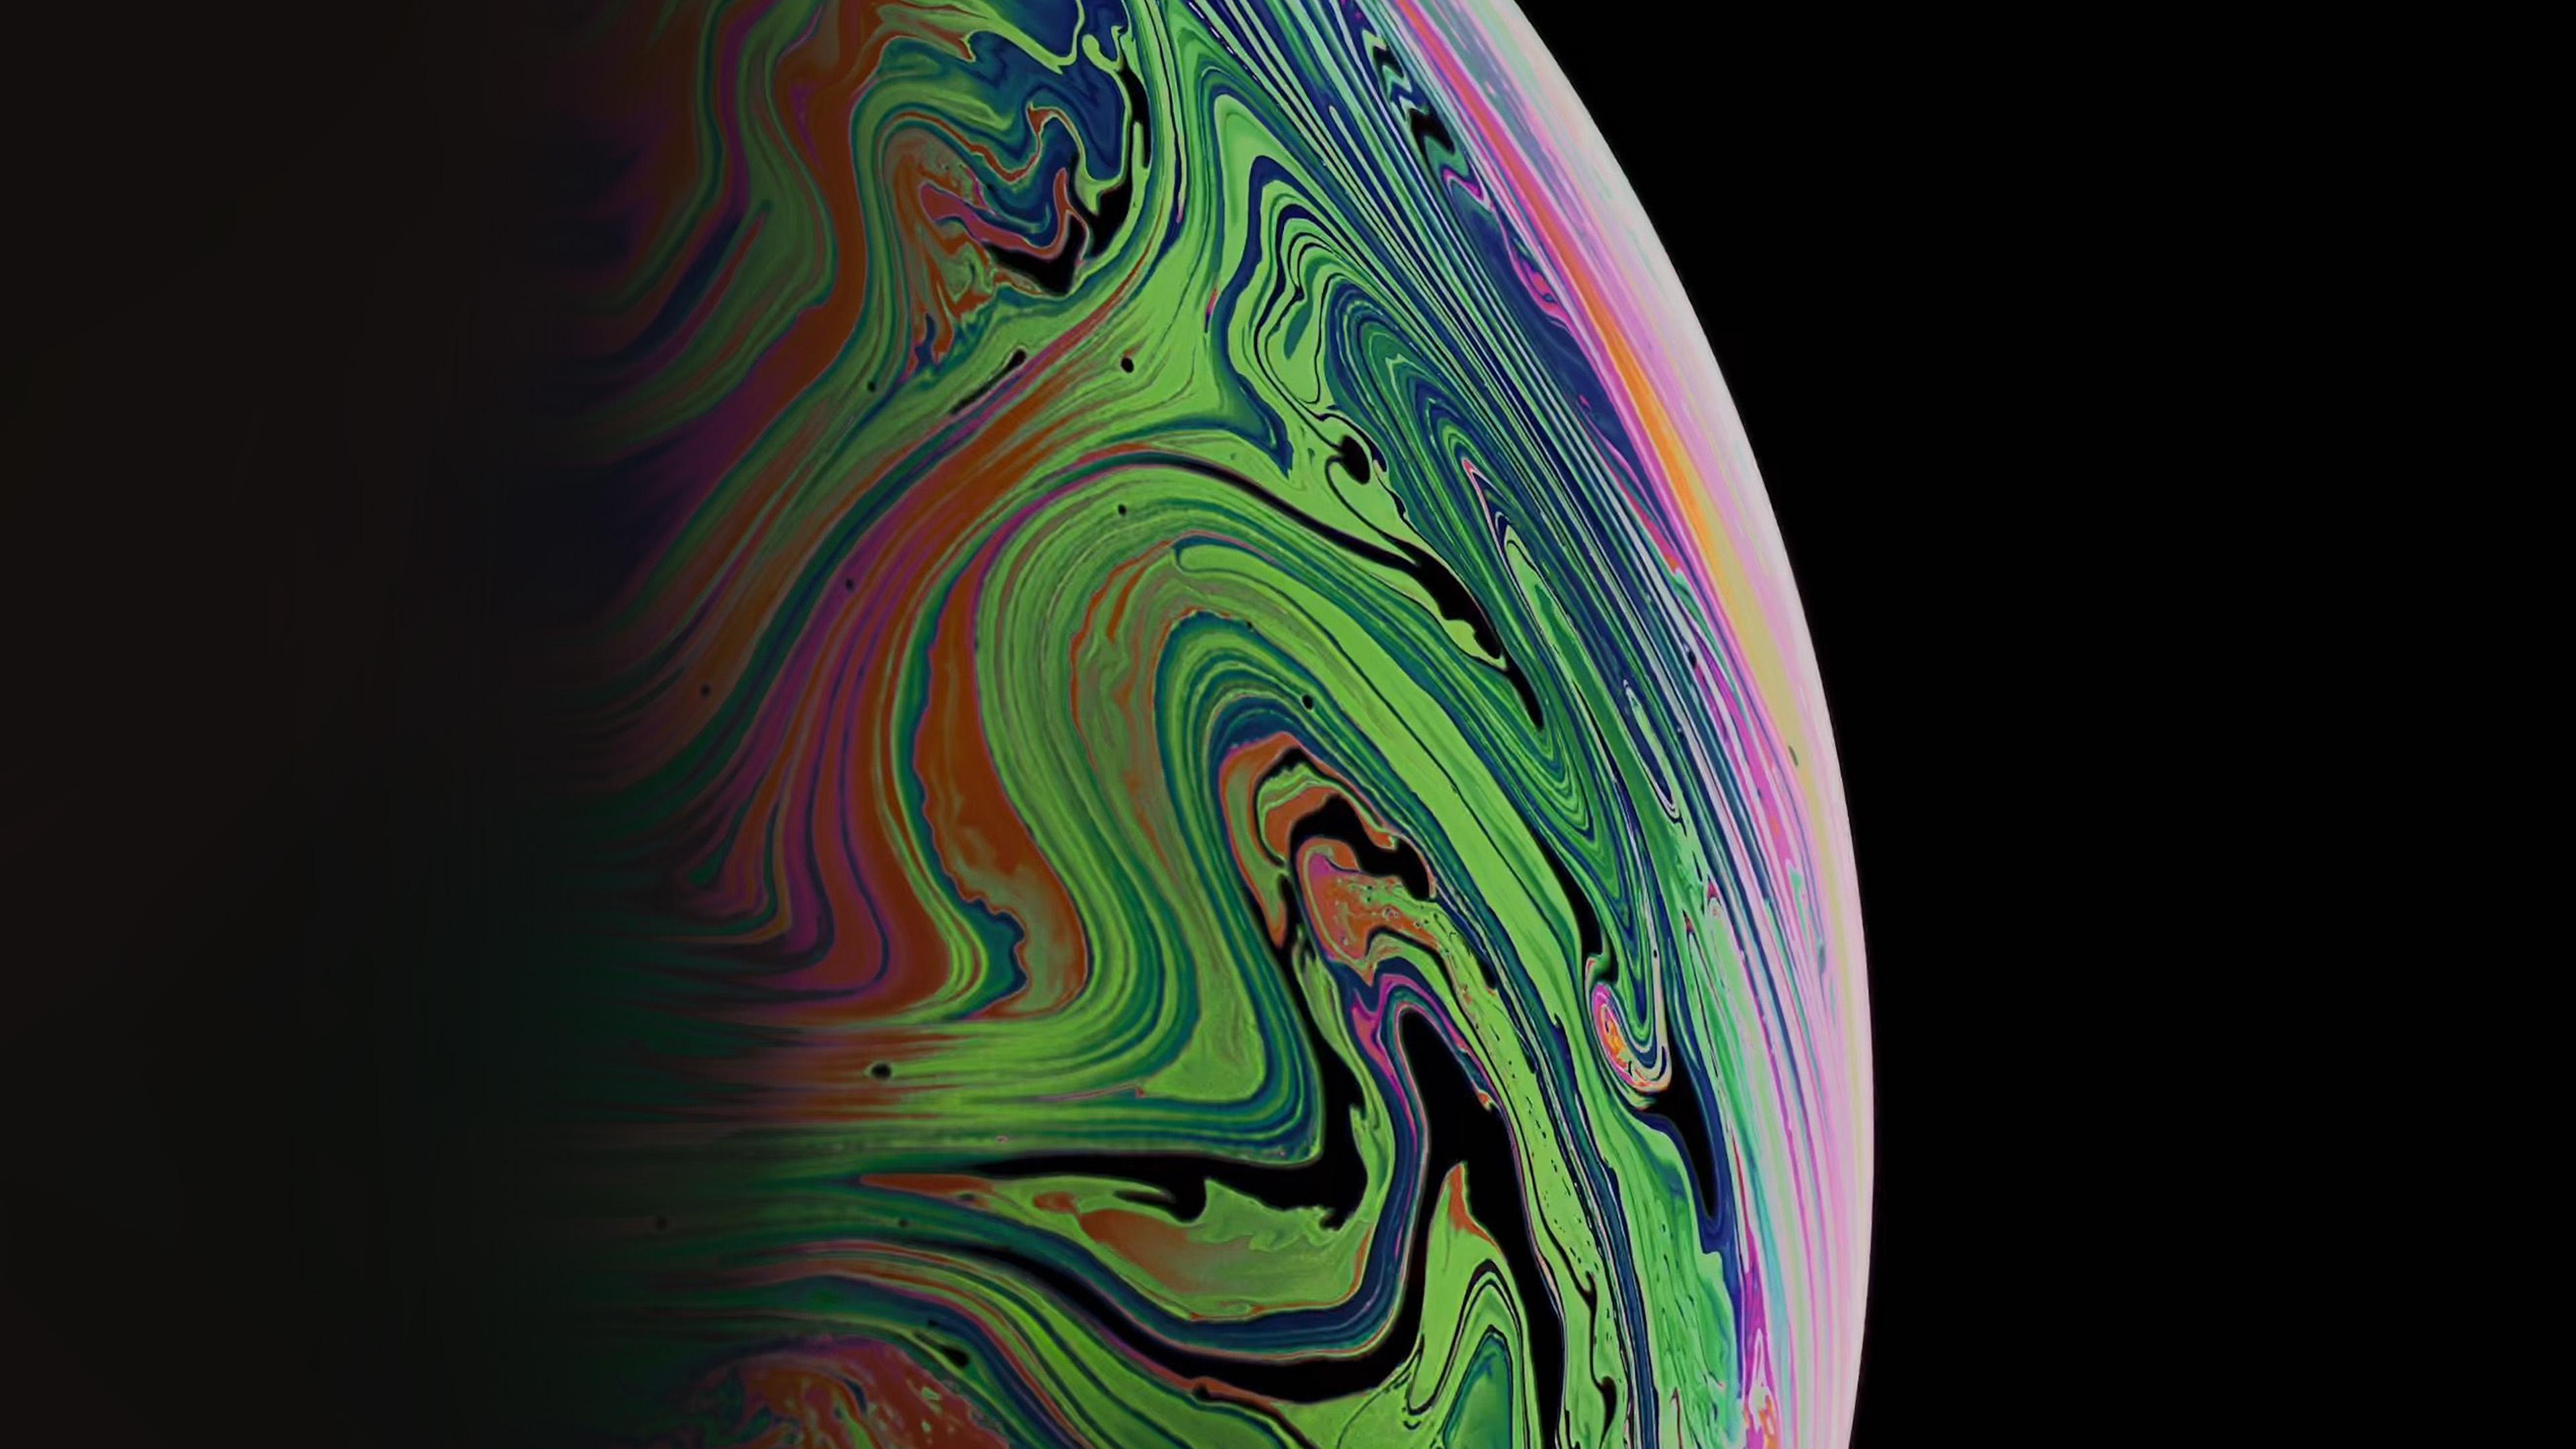 Bg37 Apple Iphonexs Max Official Art Wallpaper